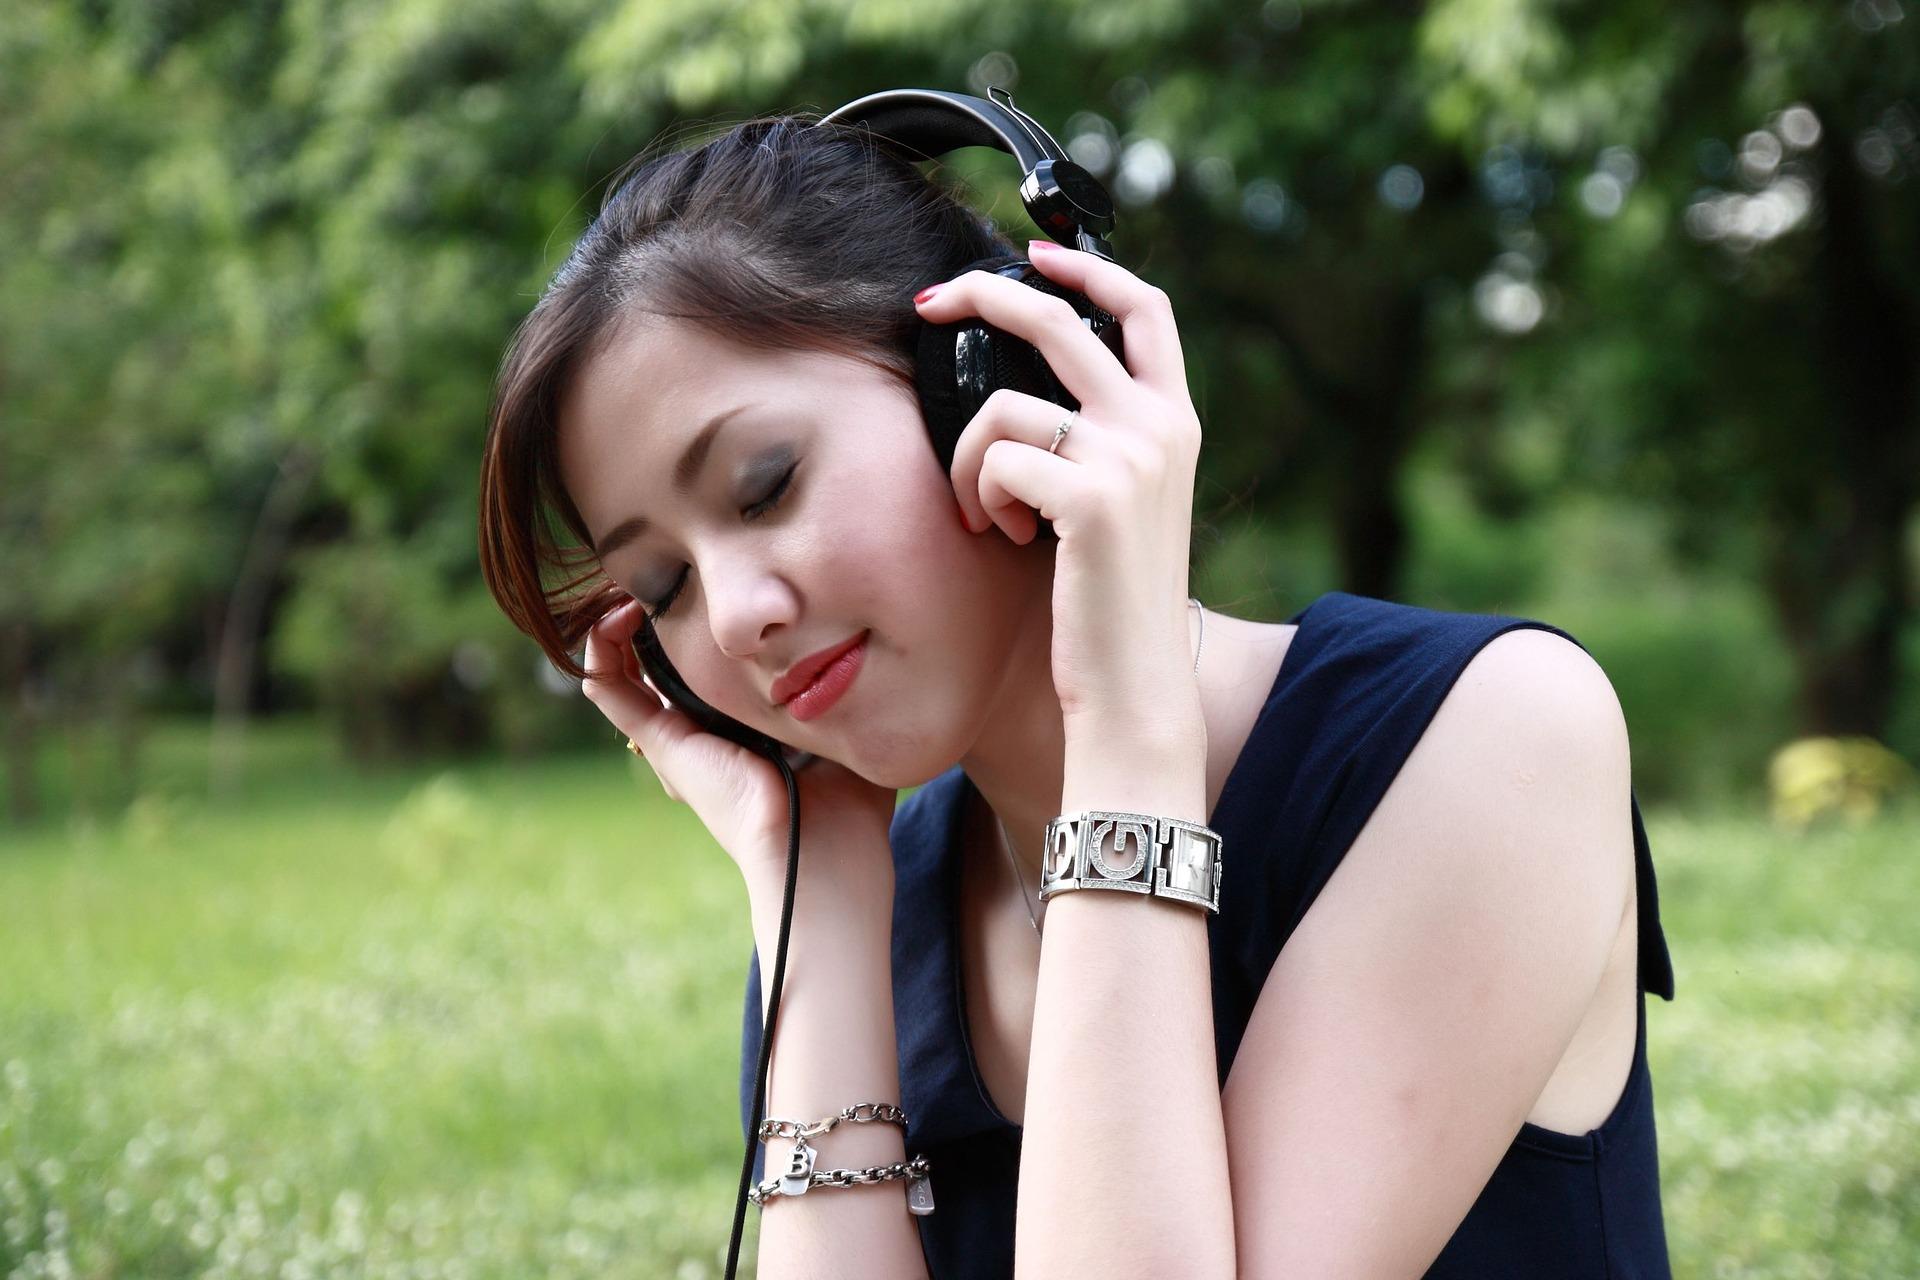 Música y dopamina